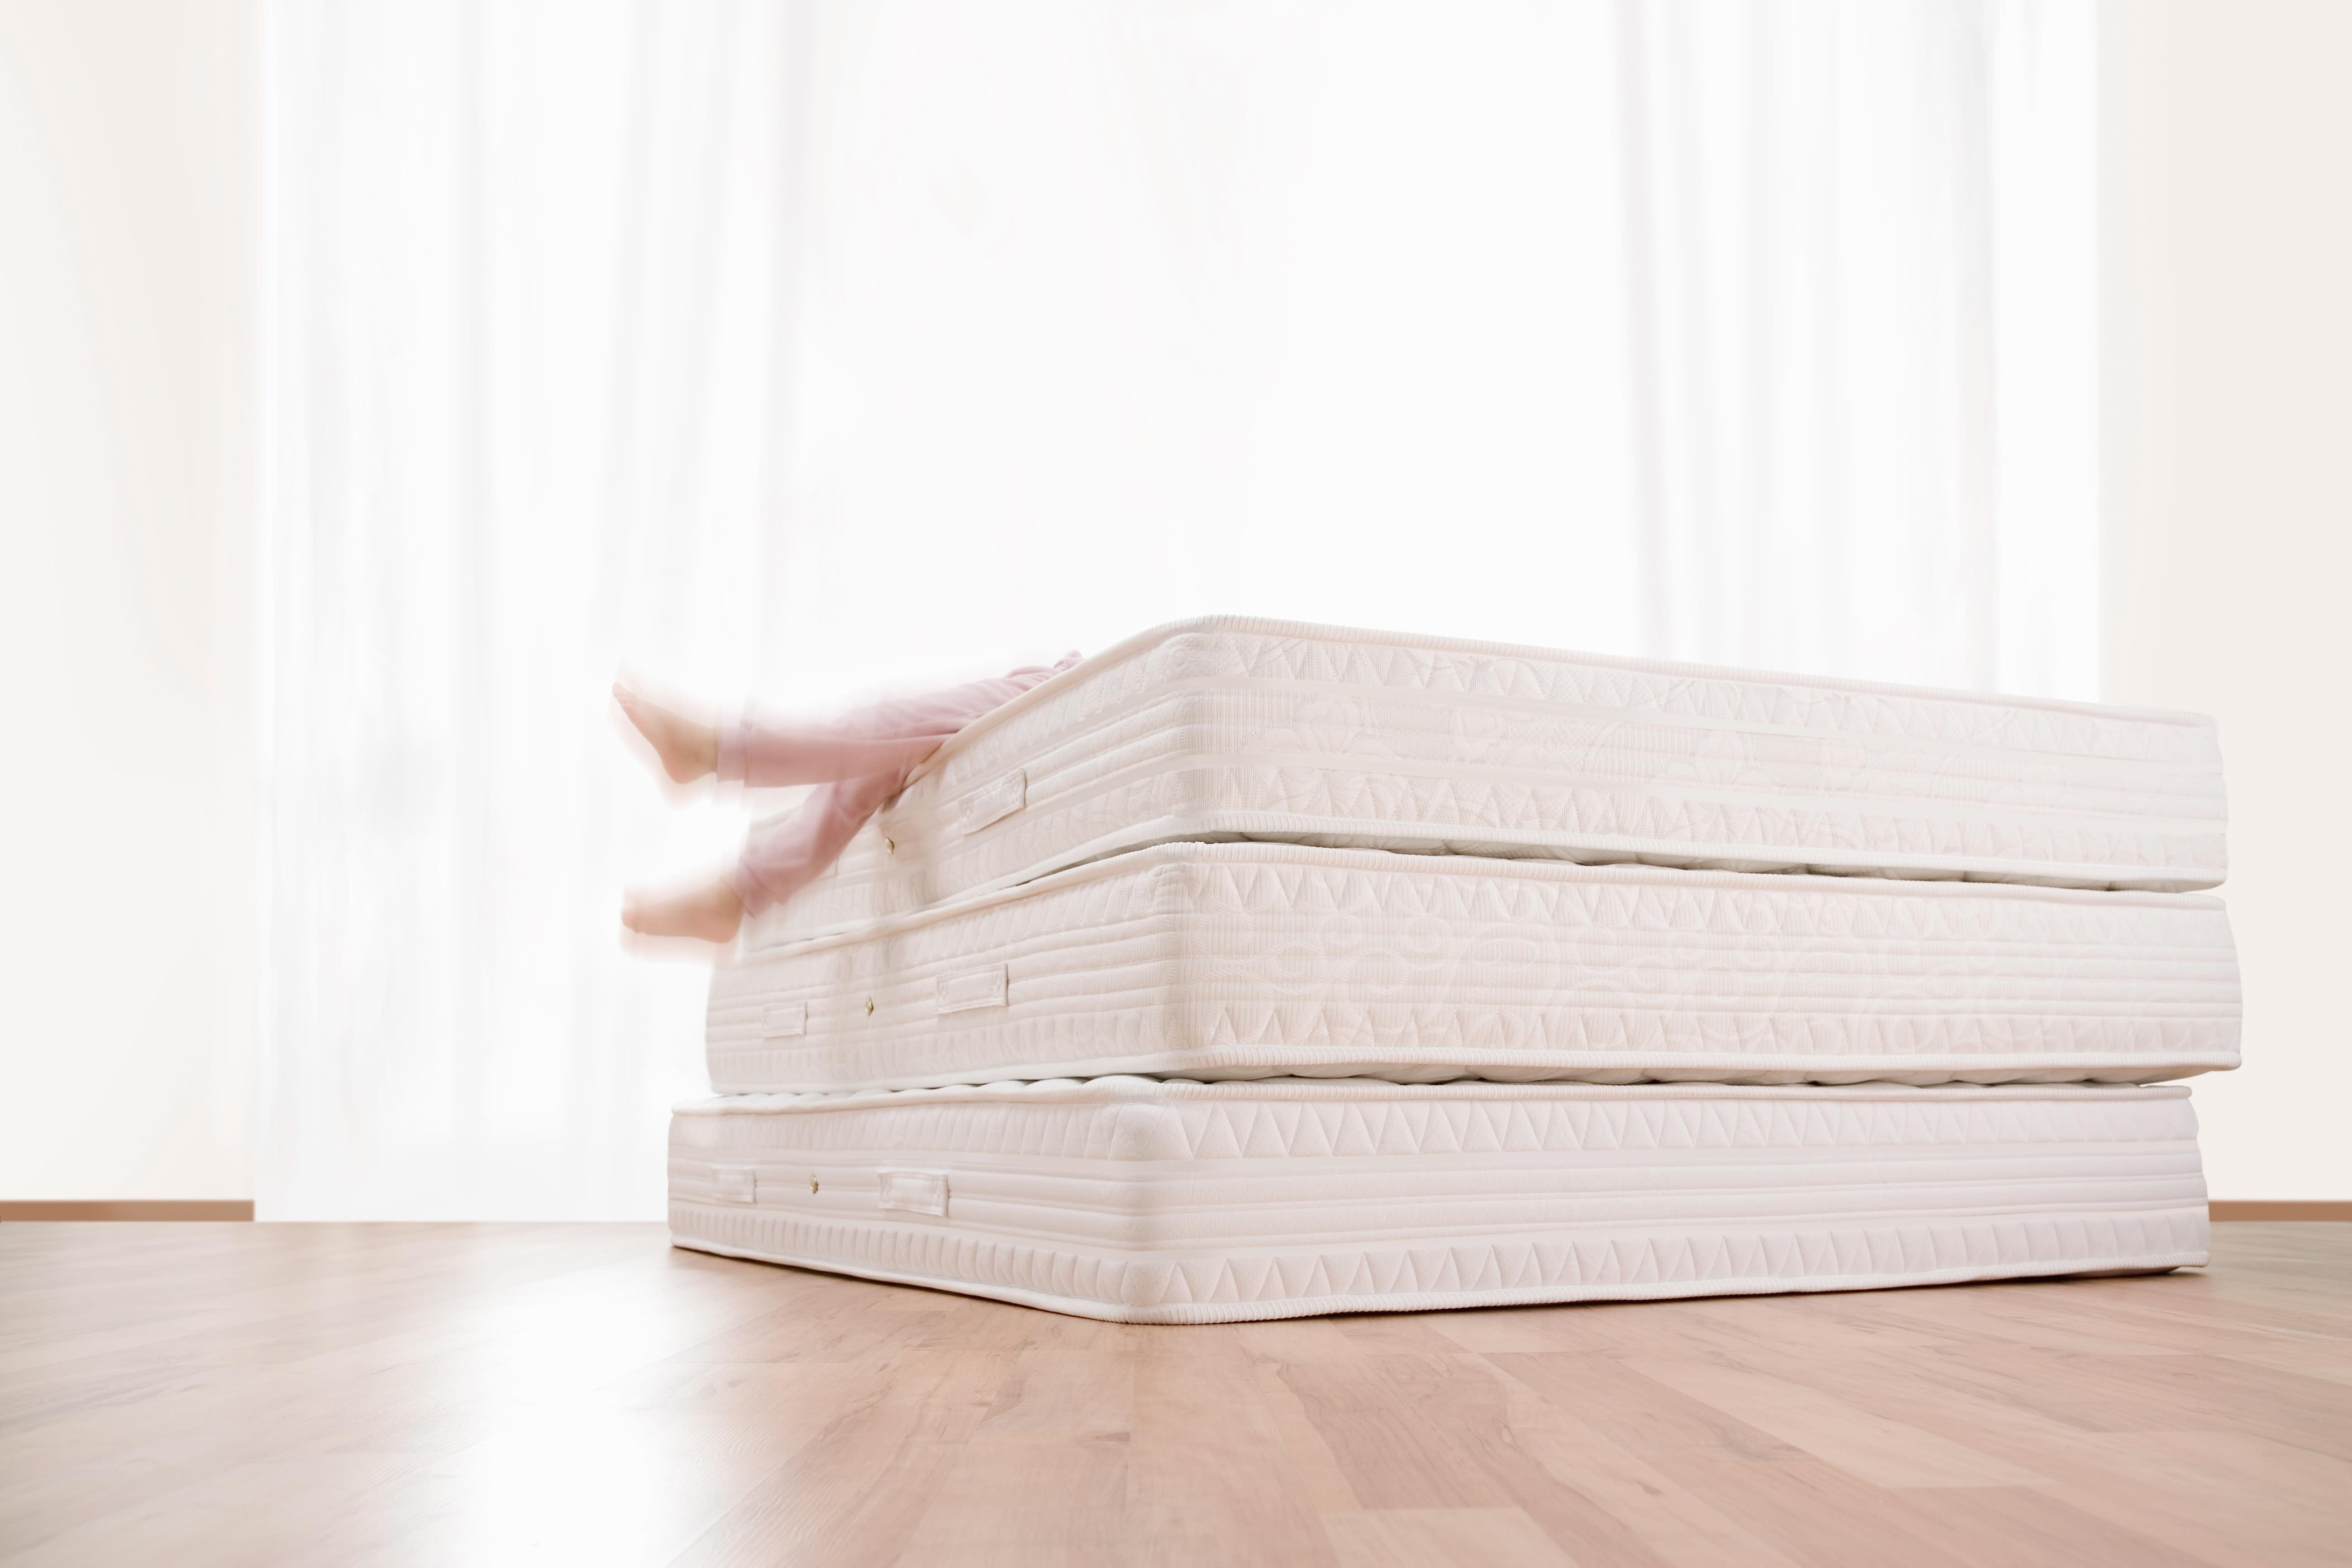 sealy consumeraffairs mattress best understanding org time mattresshelp source to warranties buy